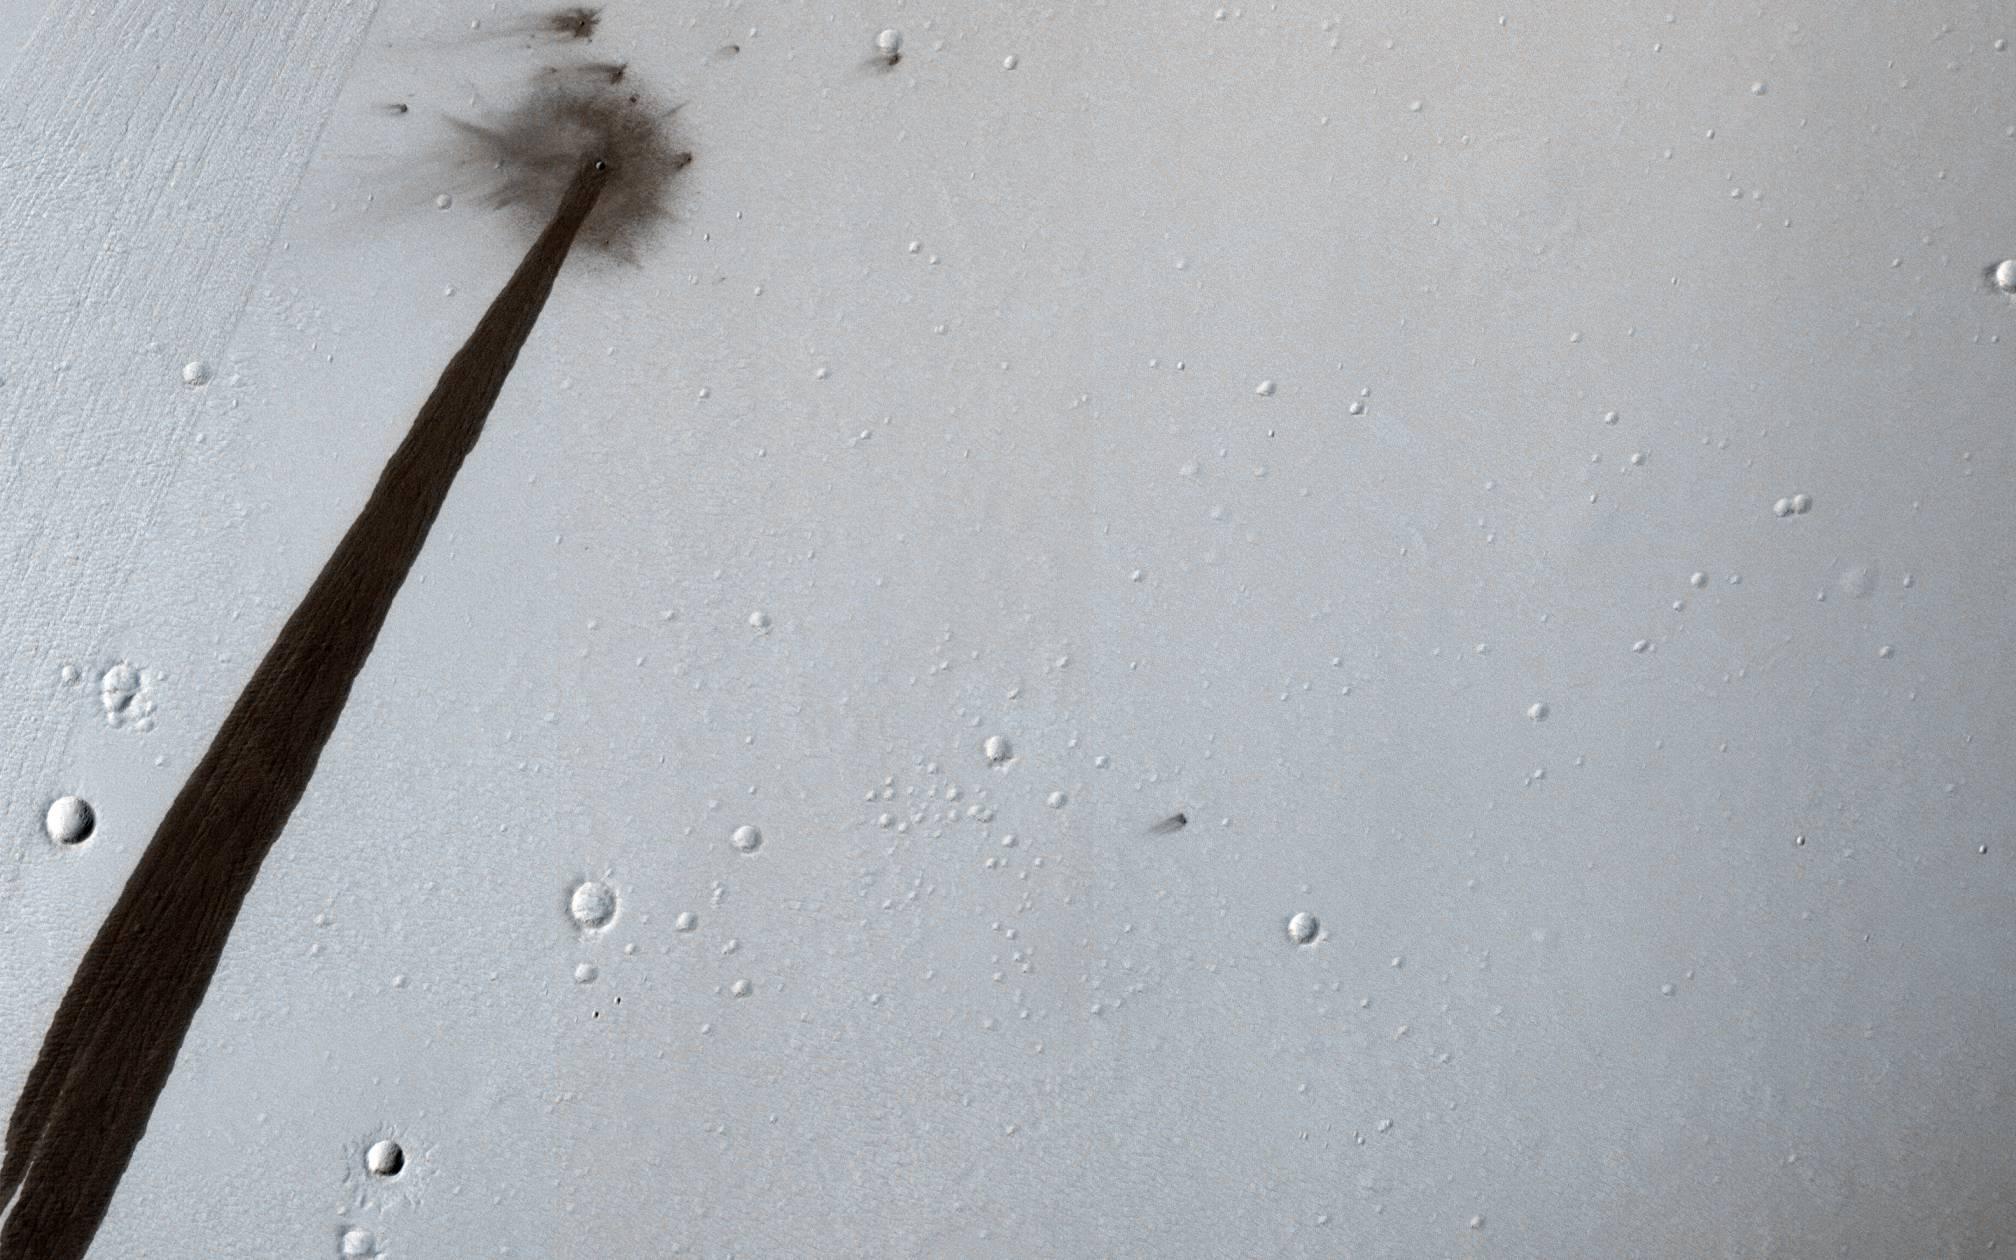 crater slope streak Feb 2018 (HiRISE)